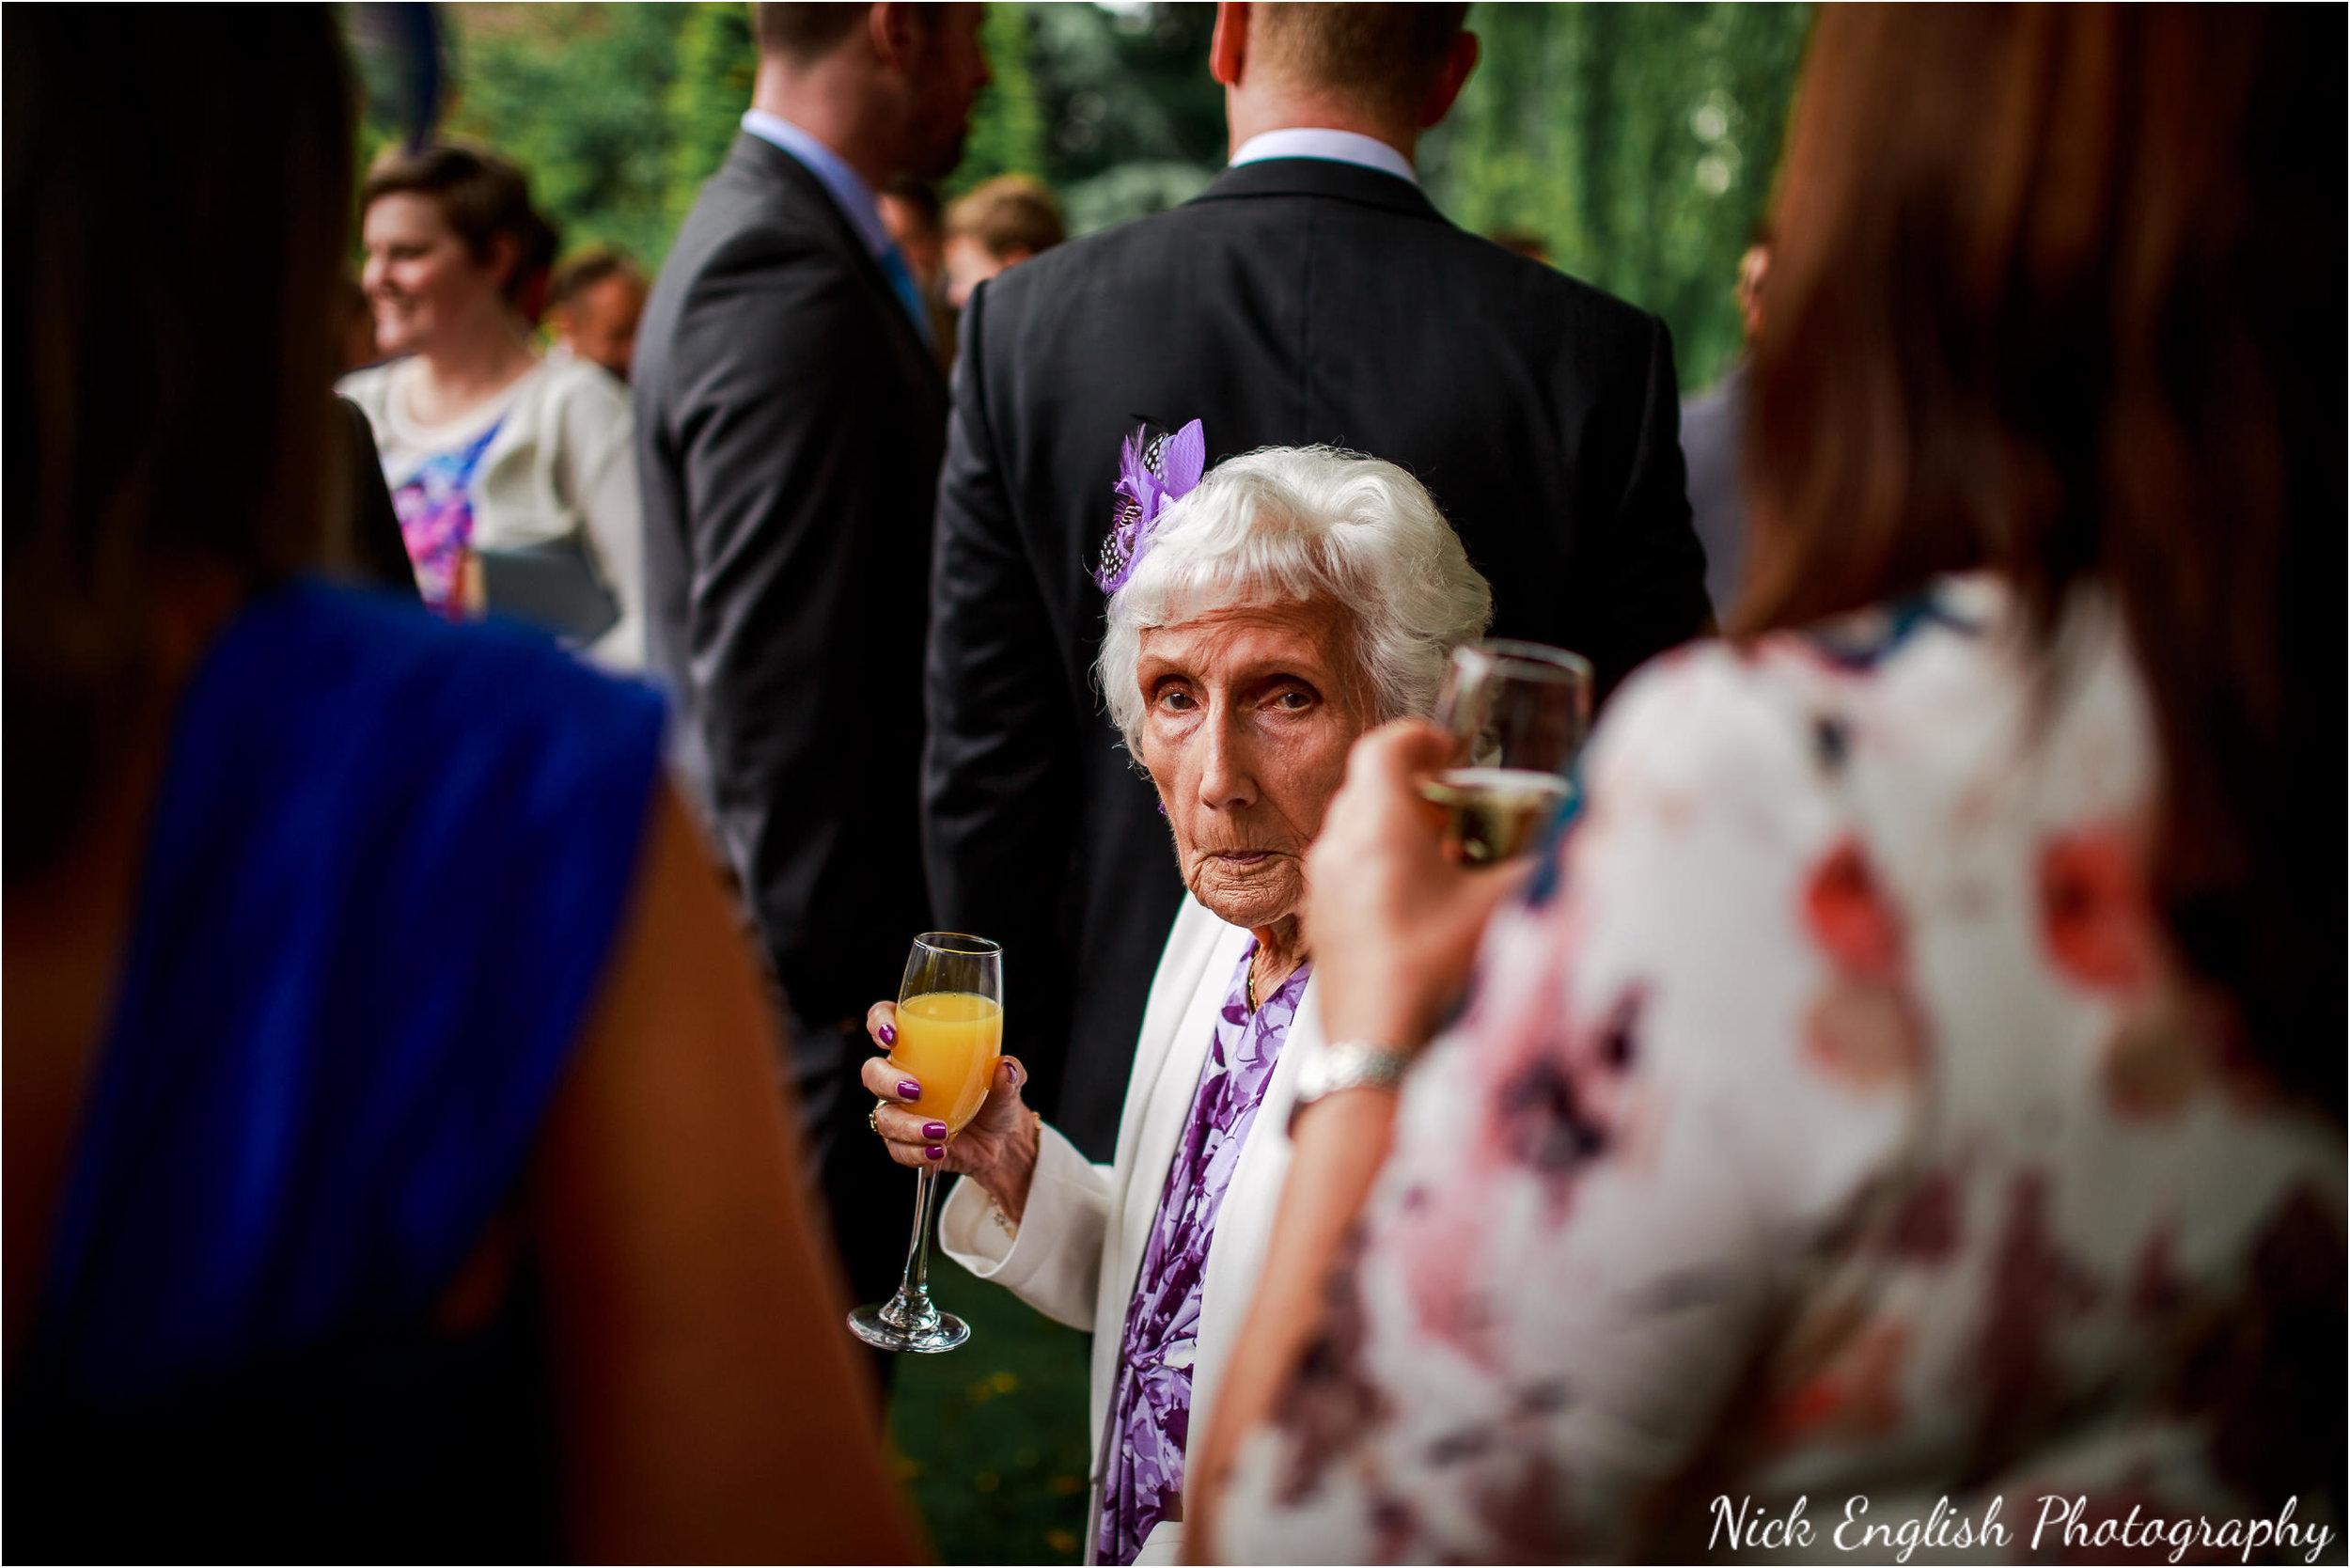 Emily David Wedding Photographs at Barton Grange Preston by Nick English Photography 104jpg.jpeg